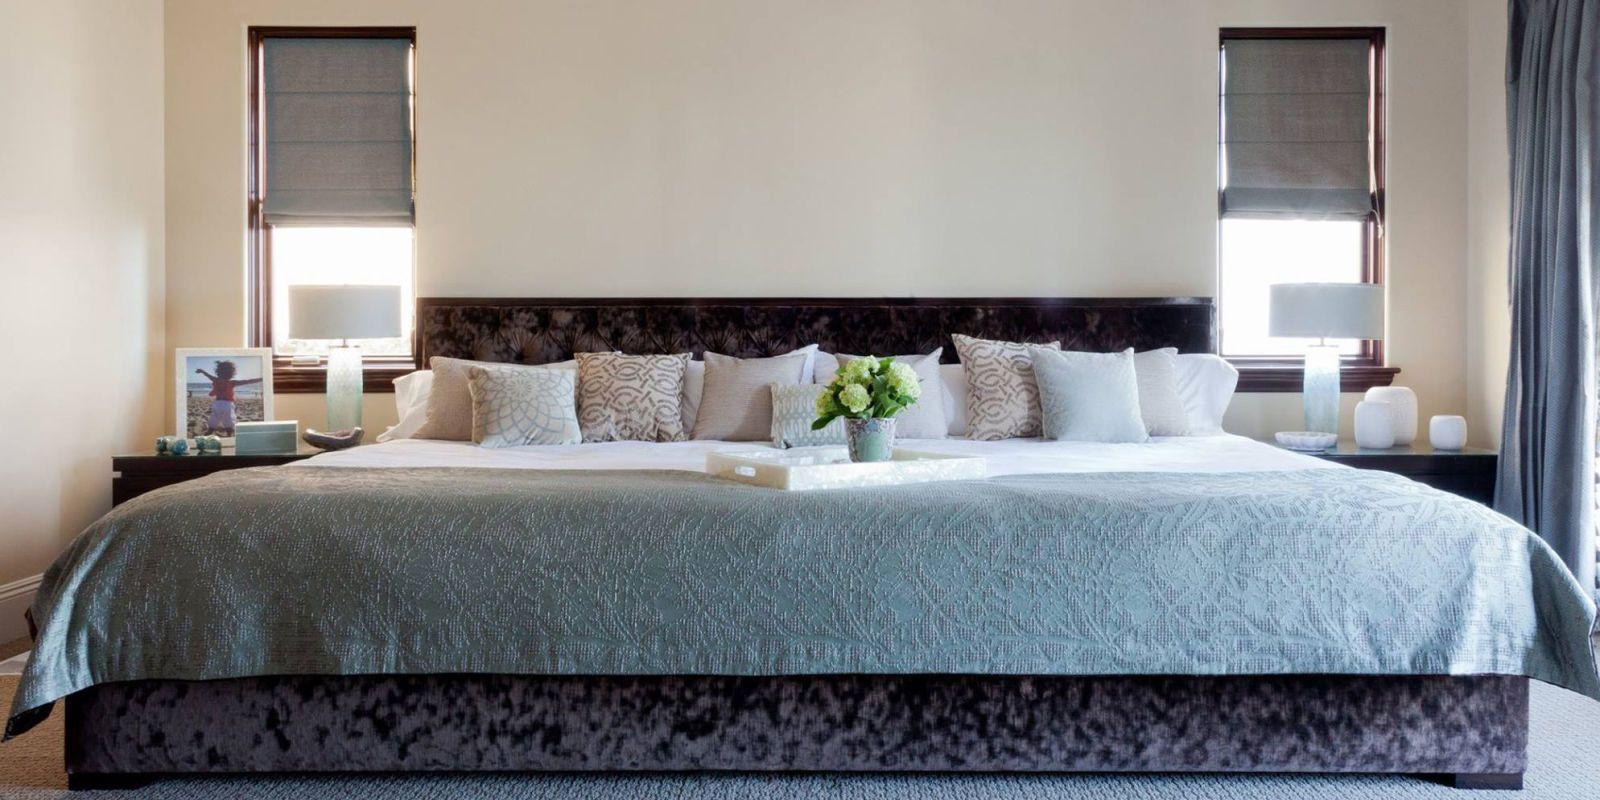 12 Foot Bed